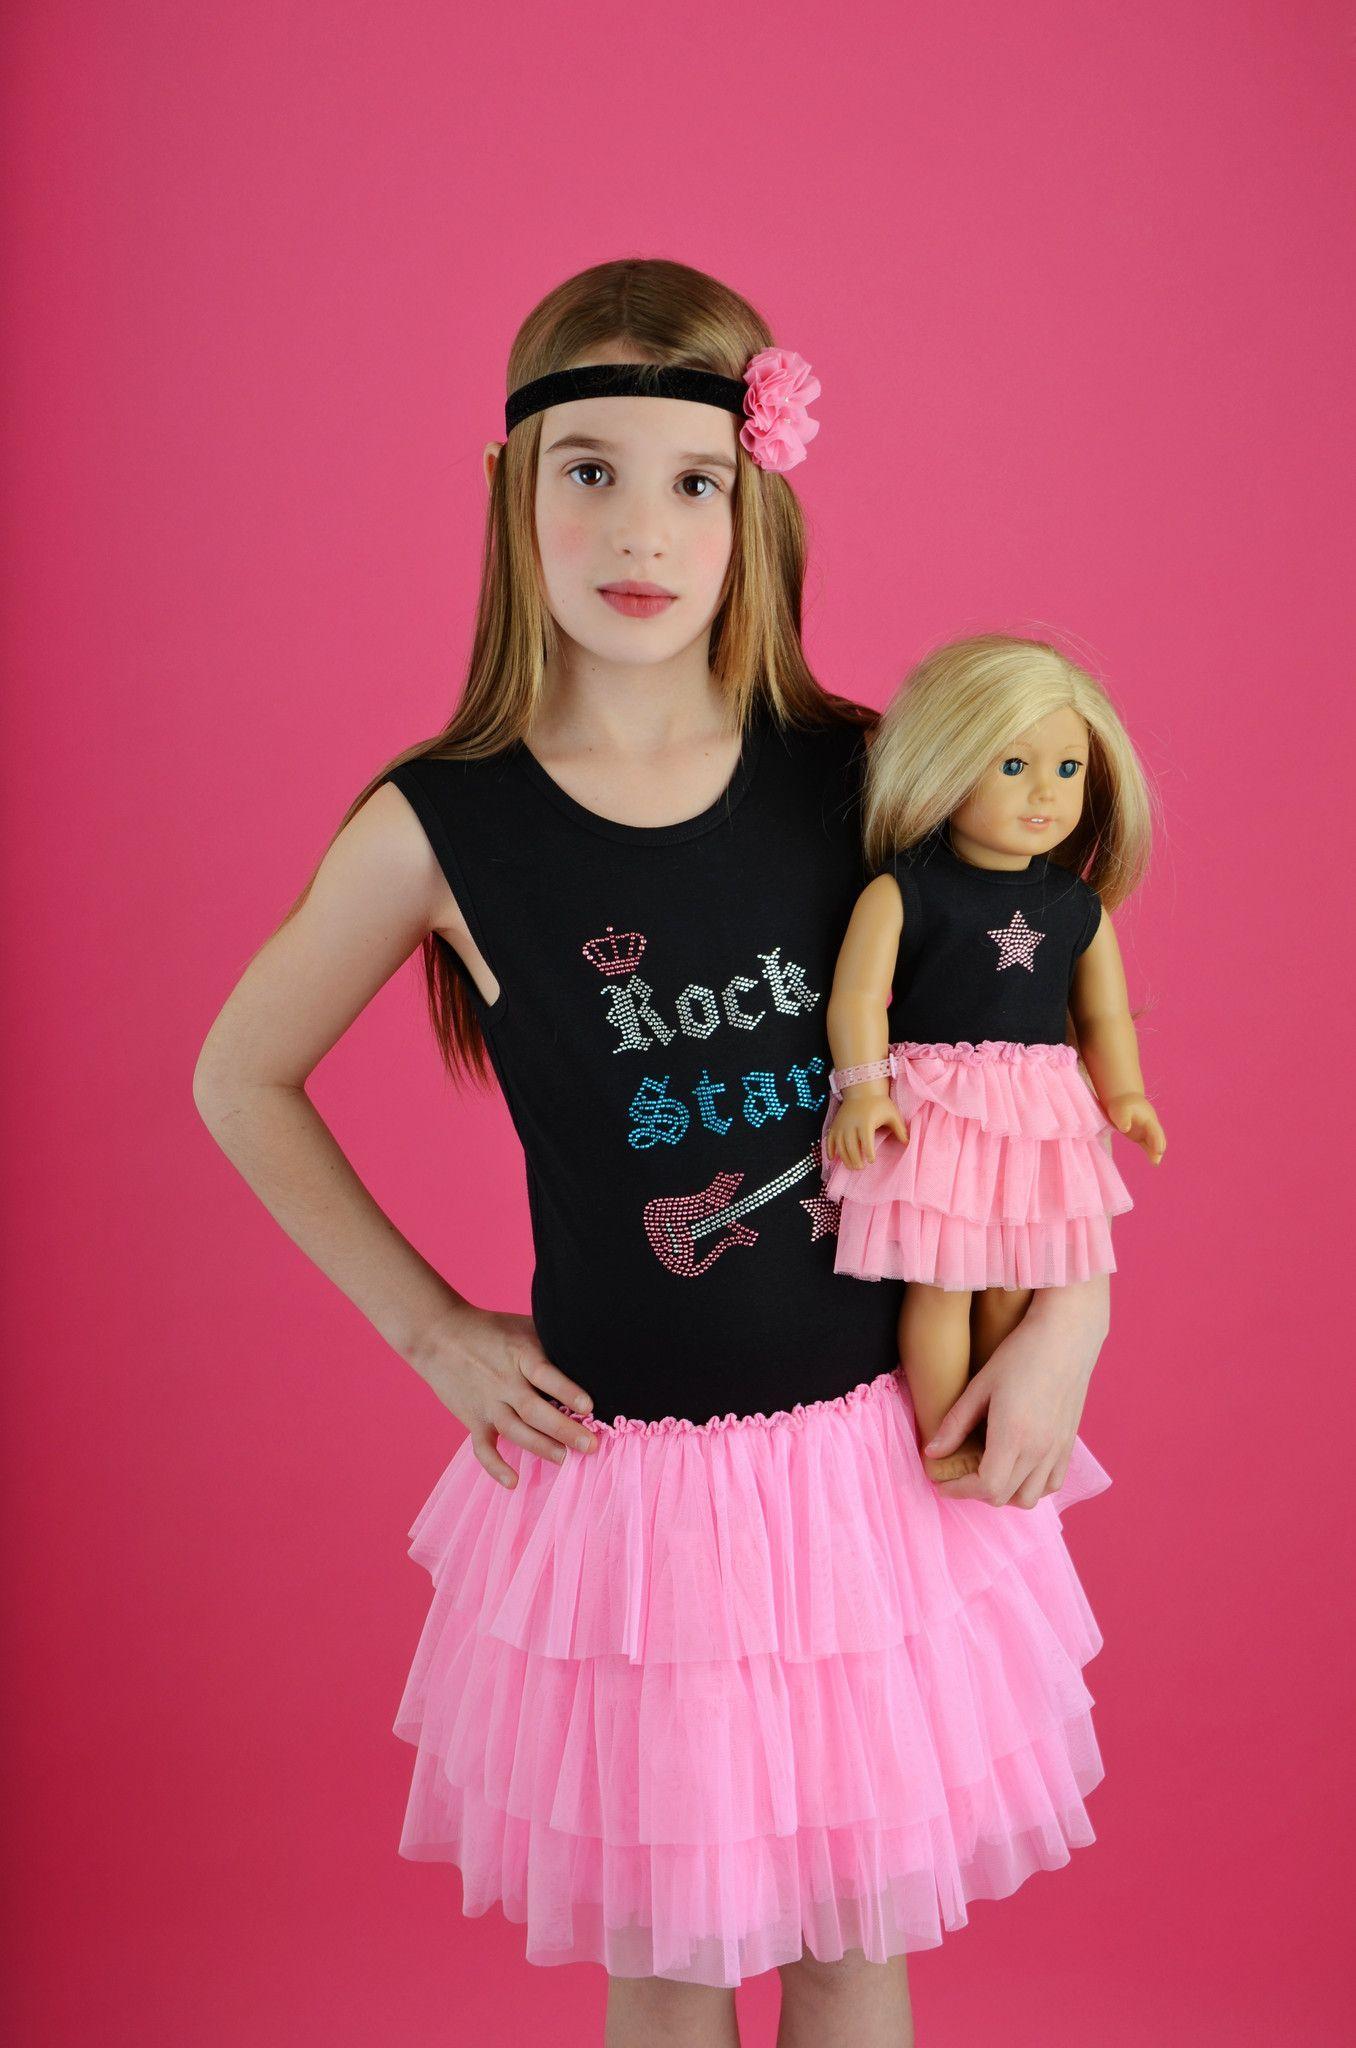 Rock Star Made to Match Girls and Doll Tutu Dress Set | Charlotte\'s ...